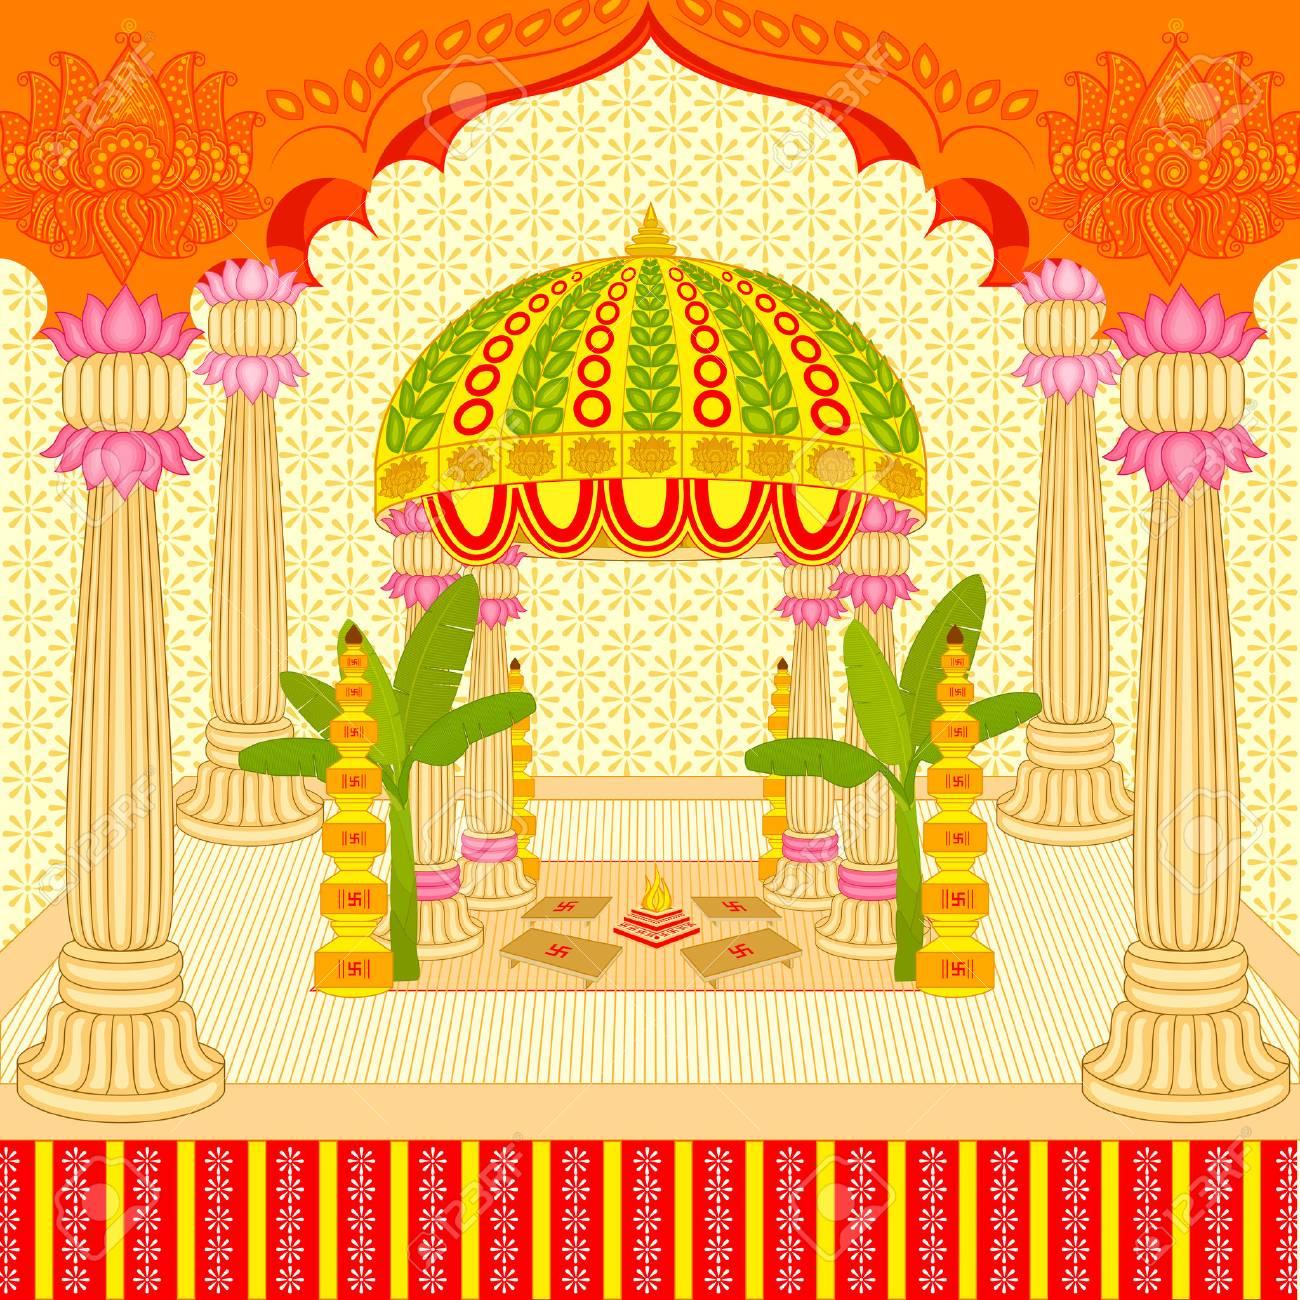 Vector illustration of indian wedding mandap stage stock photo vector illustration of indian wedding mandap stage stock illustration 26446132 junglespirit Gallery